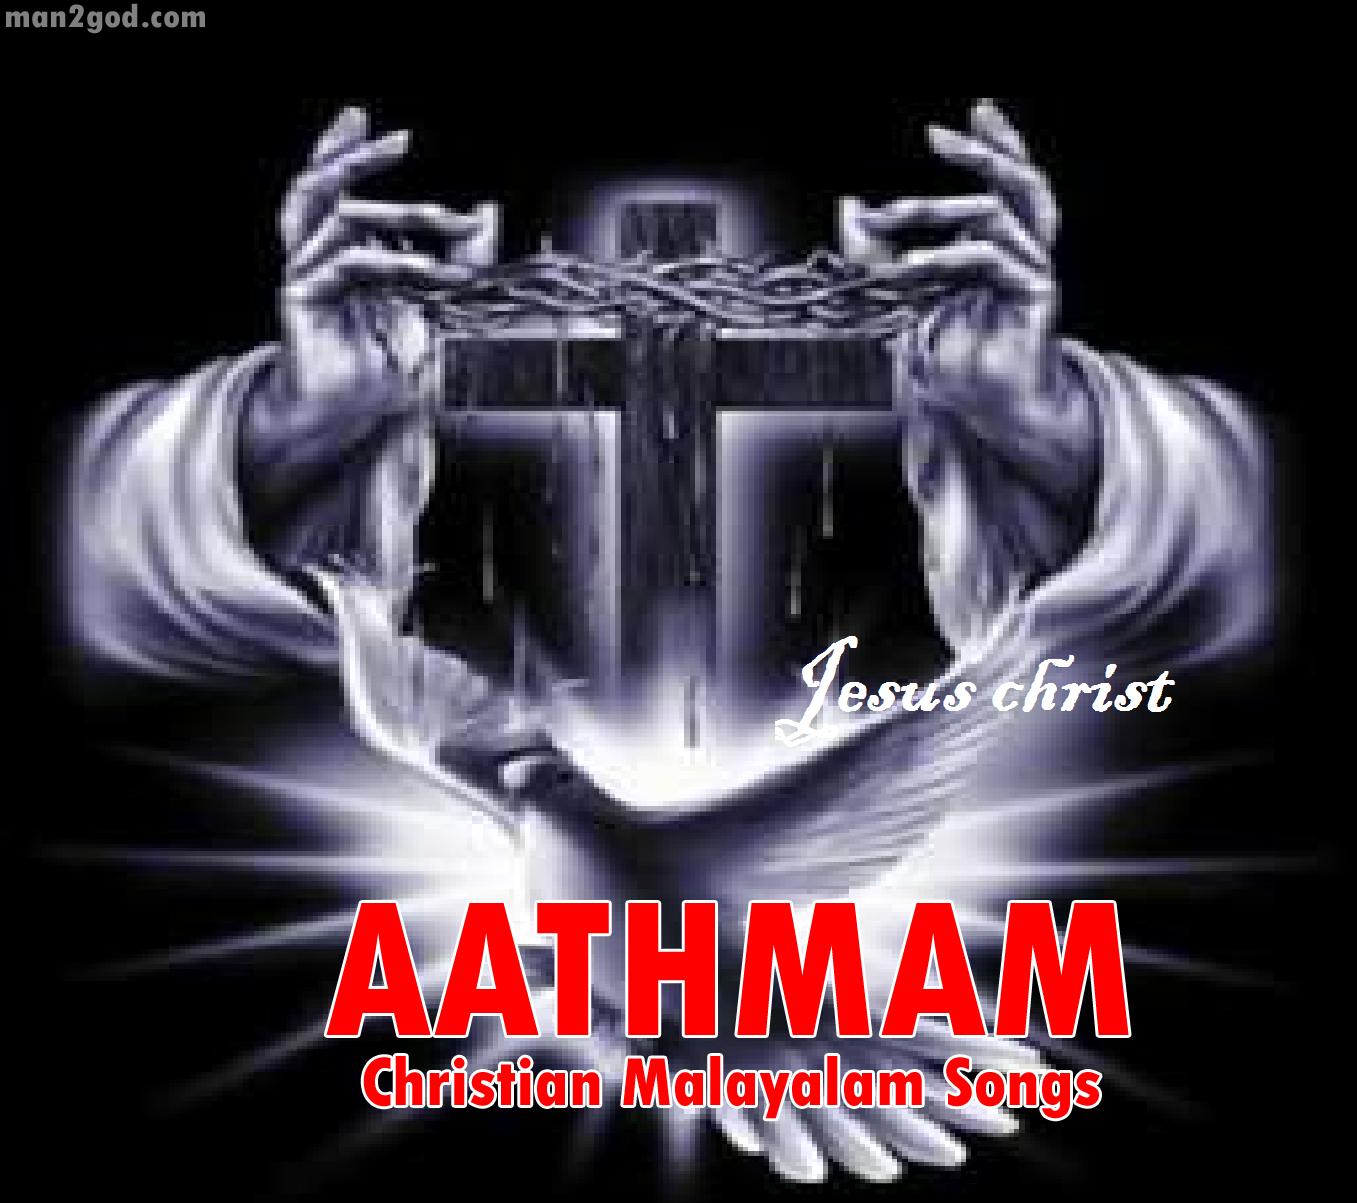 aathmam christian malayalam songs free download christian songs